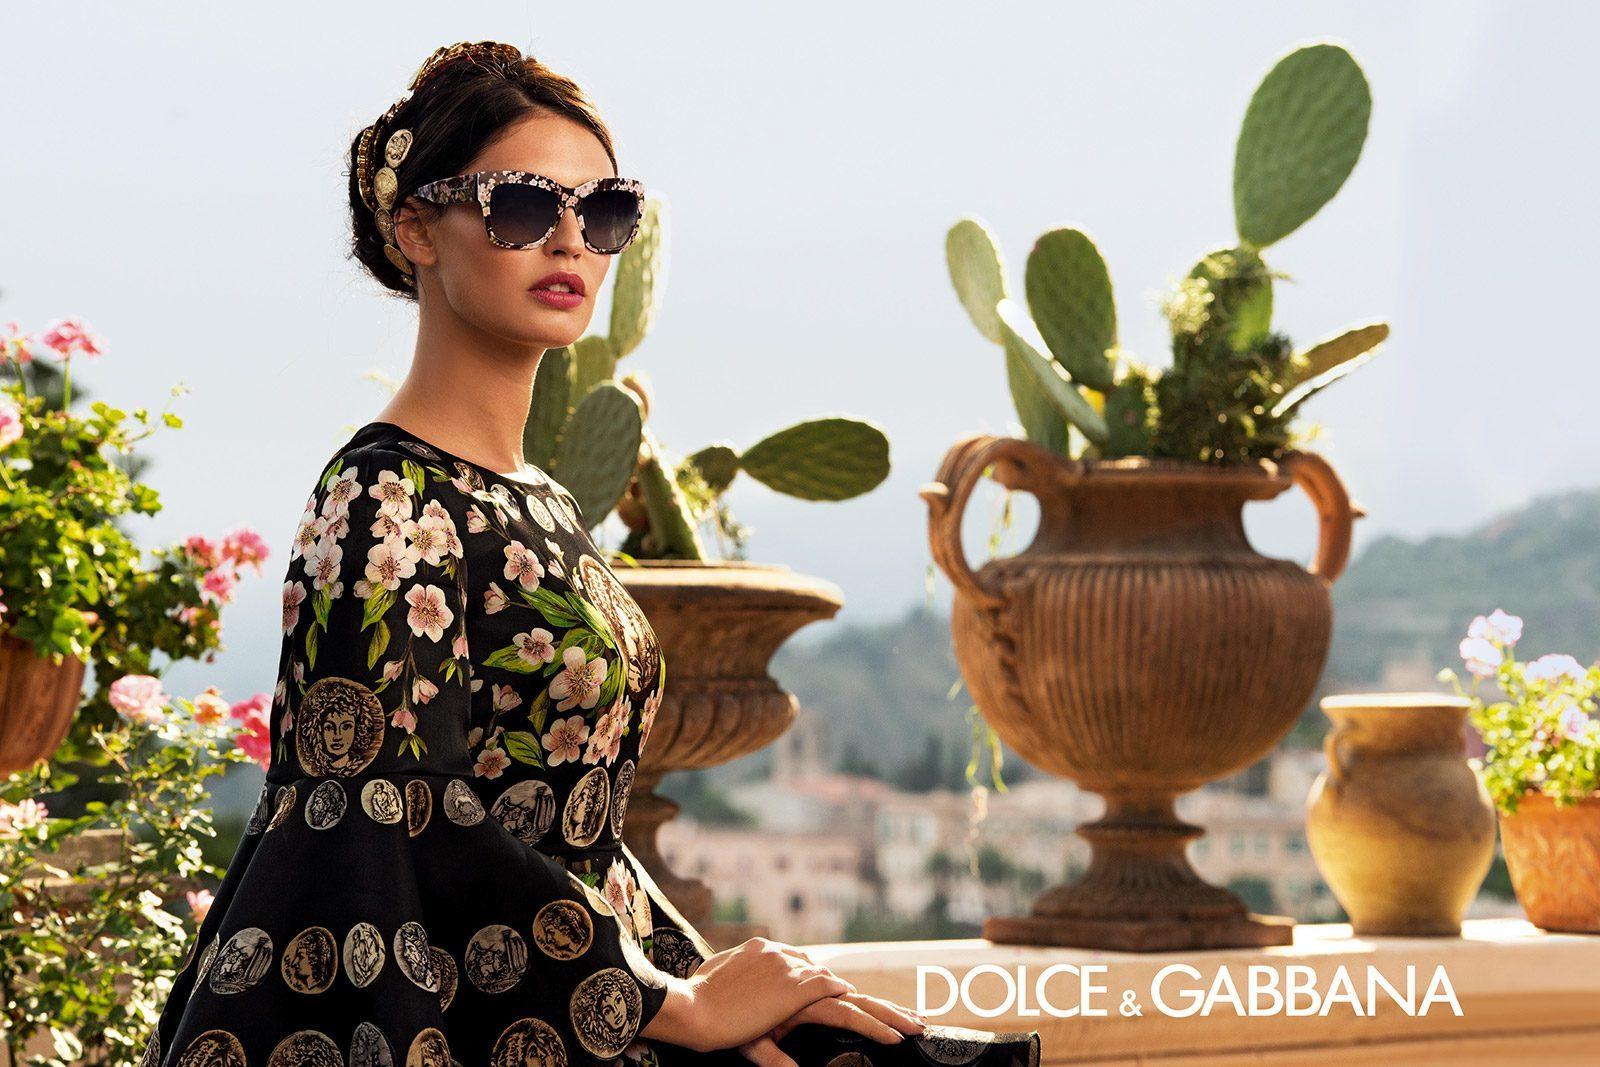 49d0f11deec dolce-gabbana-sunglasses-campaign-2014-women – SelectSpecs Glasses Blog